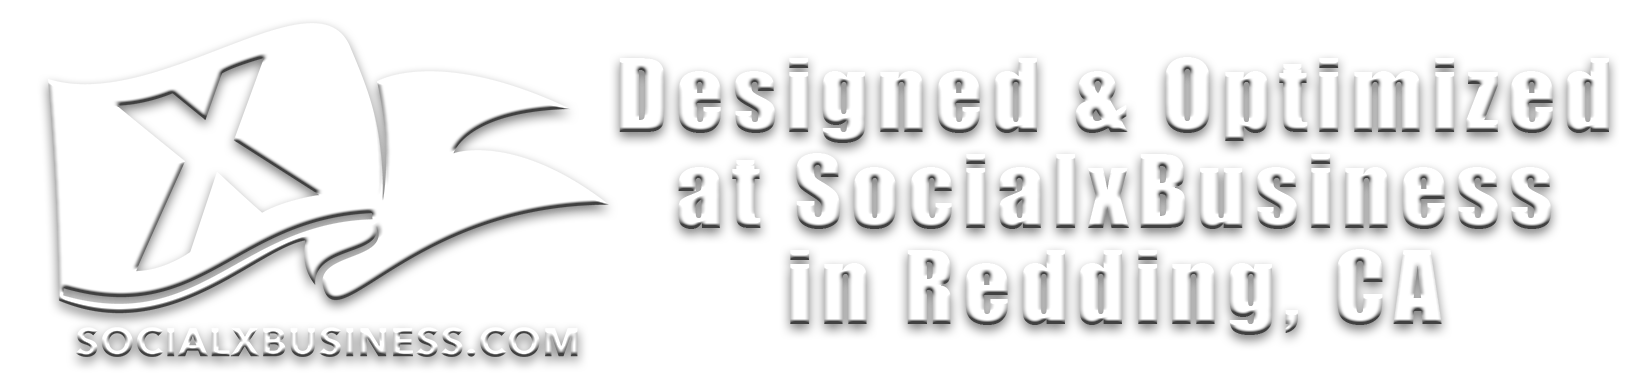 Website Design & Optimized By SocialxBusiness.jpg